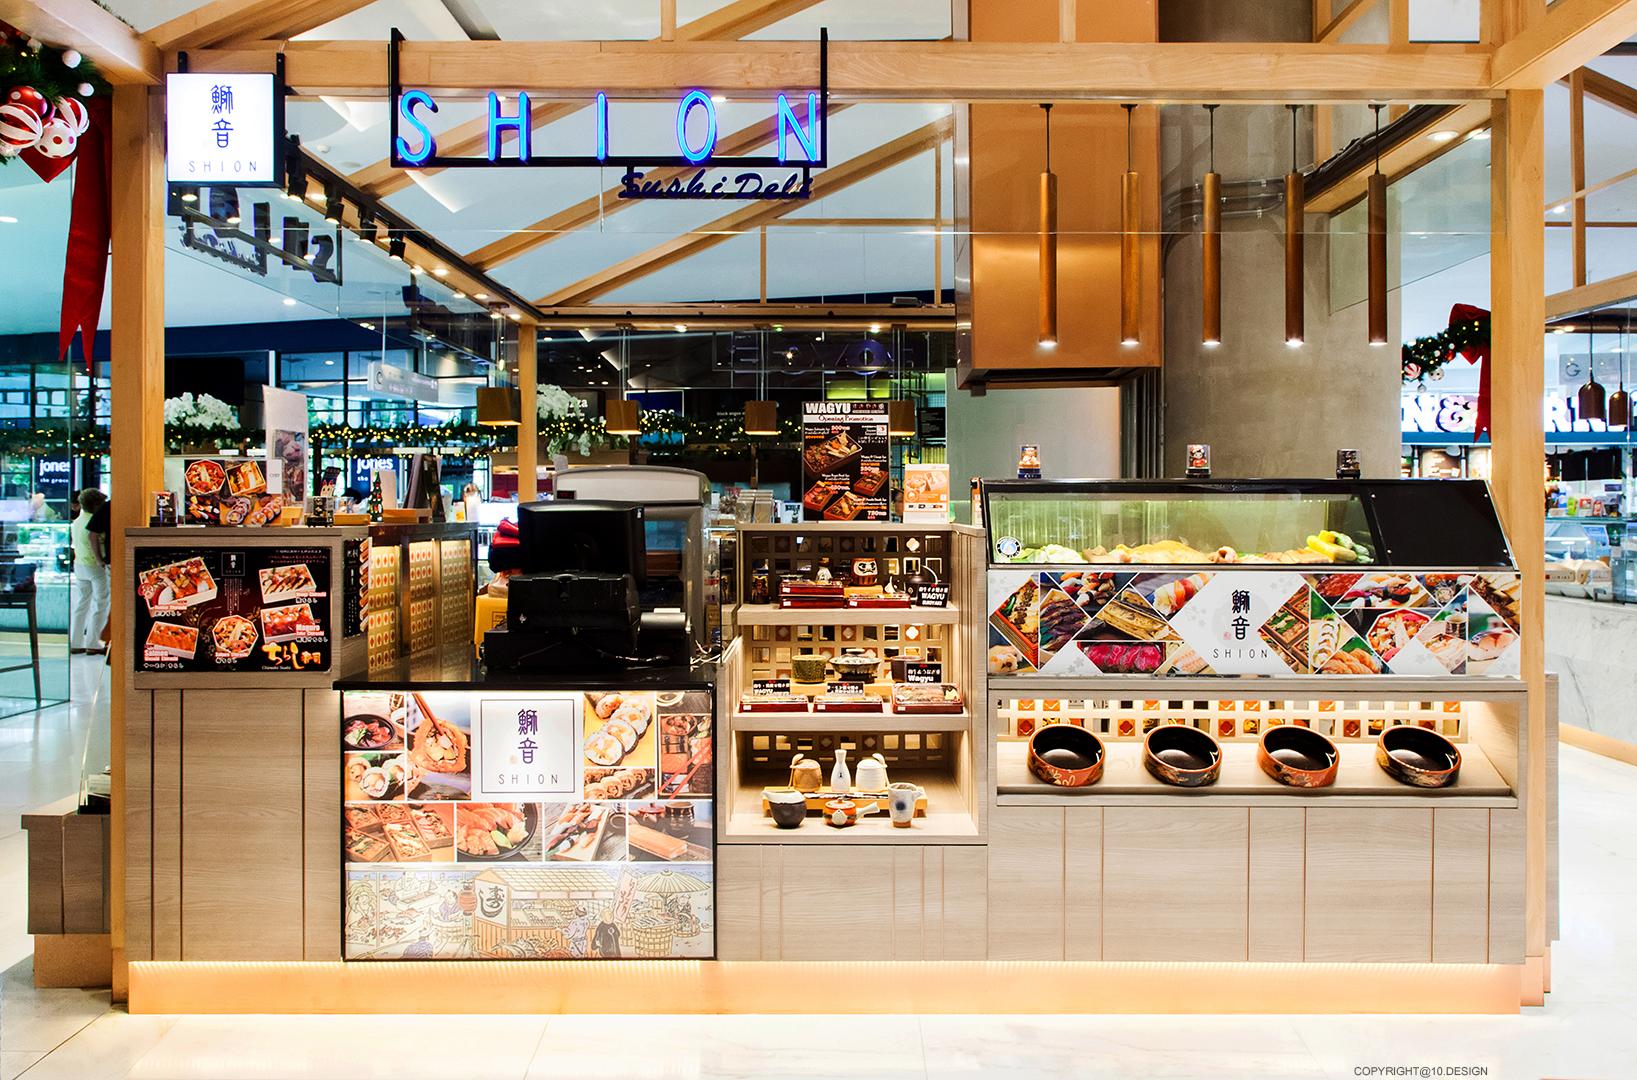 10 design shion sushi bar japanese booth takeaway interior emquartier bangkok restaurant 07